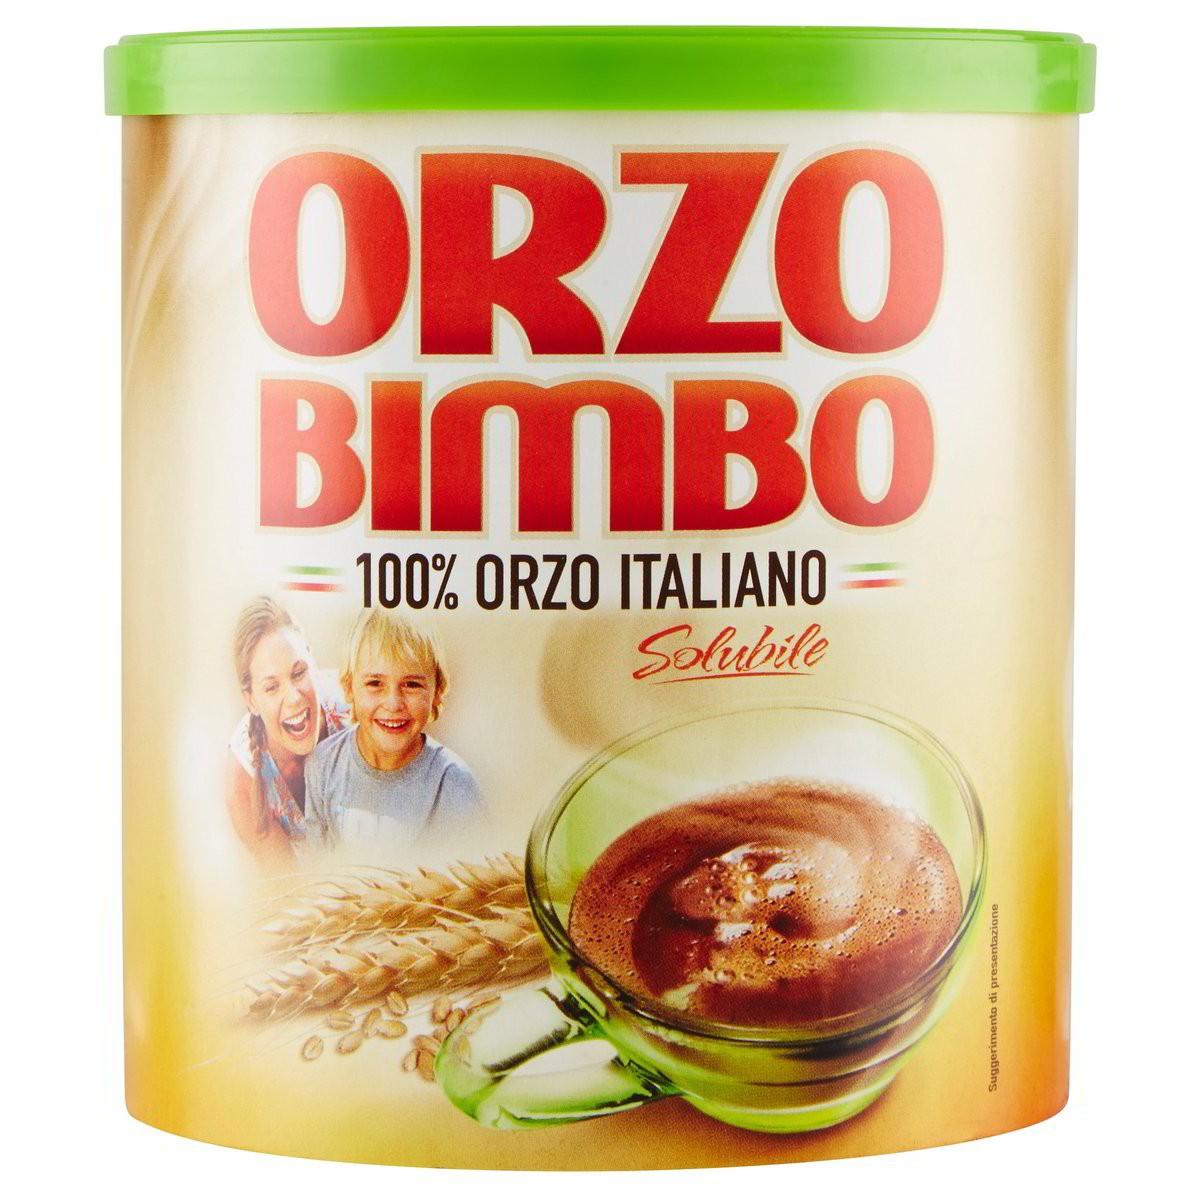 Orzo Bimbo Orzo solubile 100% italiano